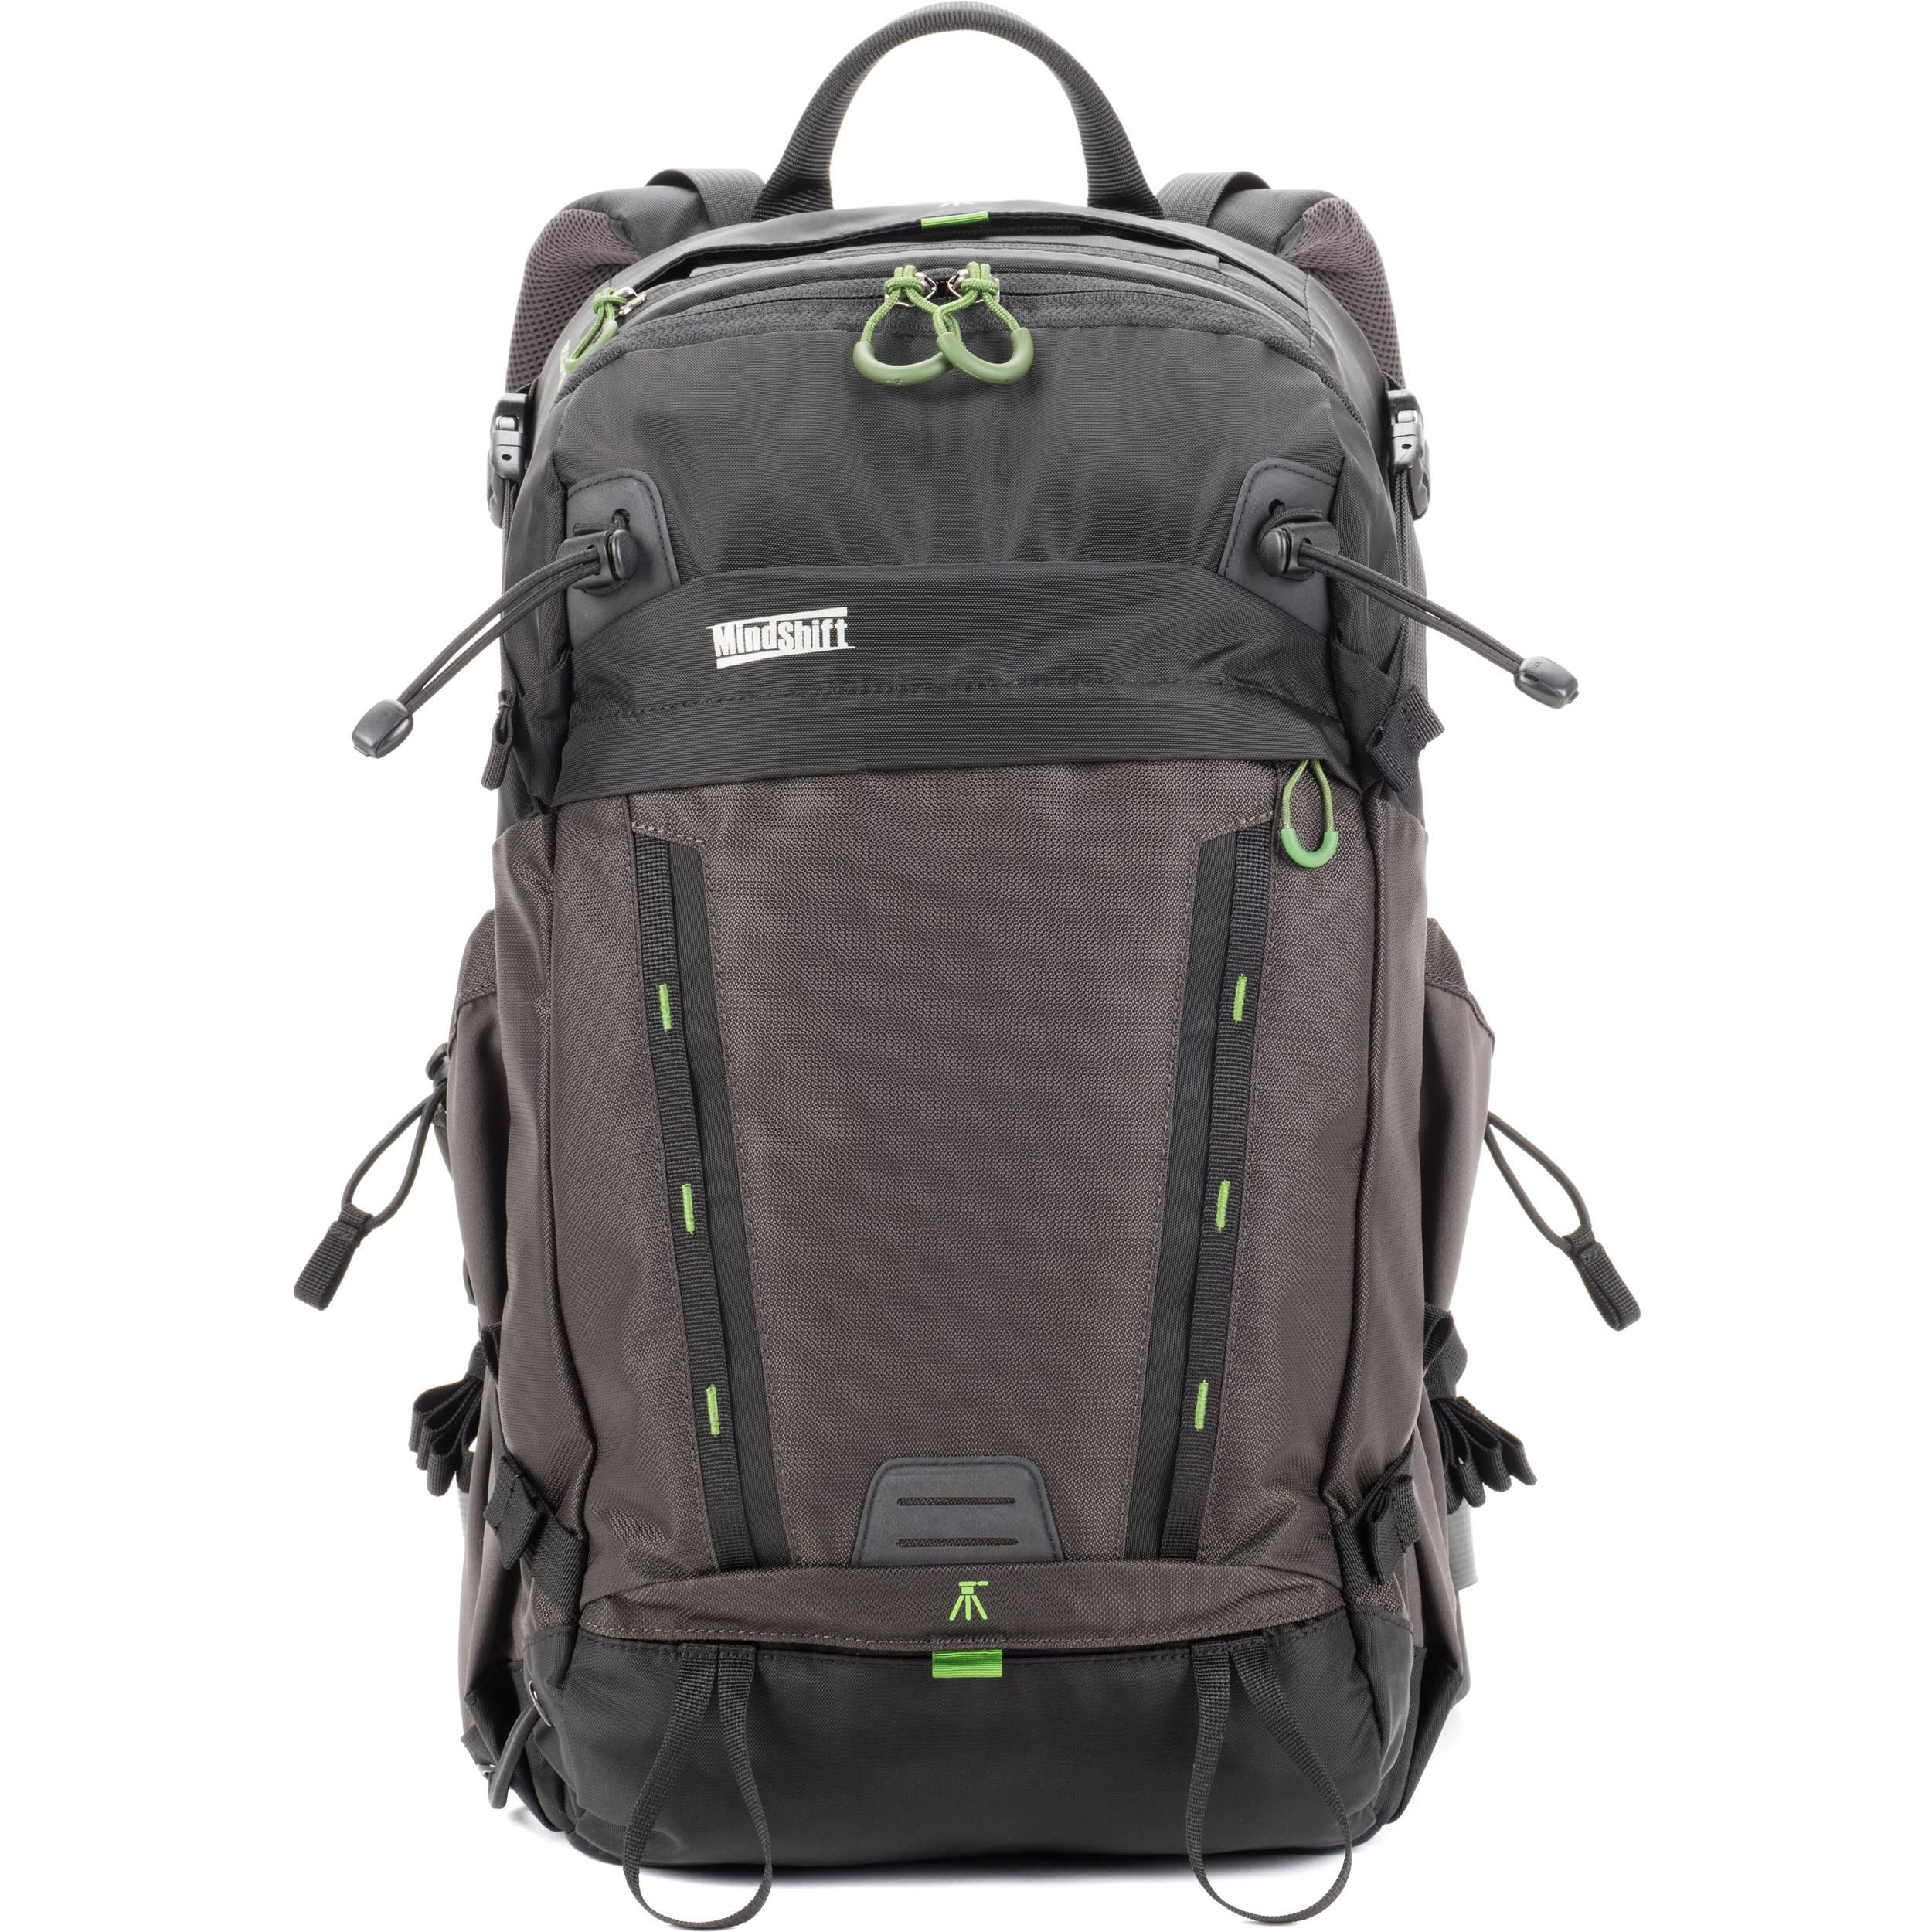 a0ca06ee3fd MindShift Gear BackLight 18L Backpack (Charcoal) 520355 B H